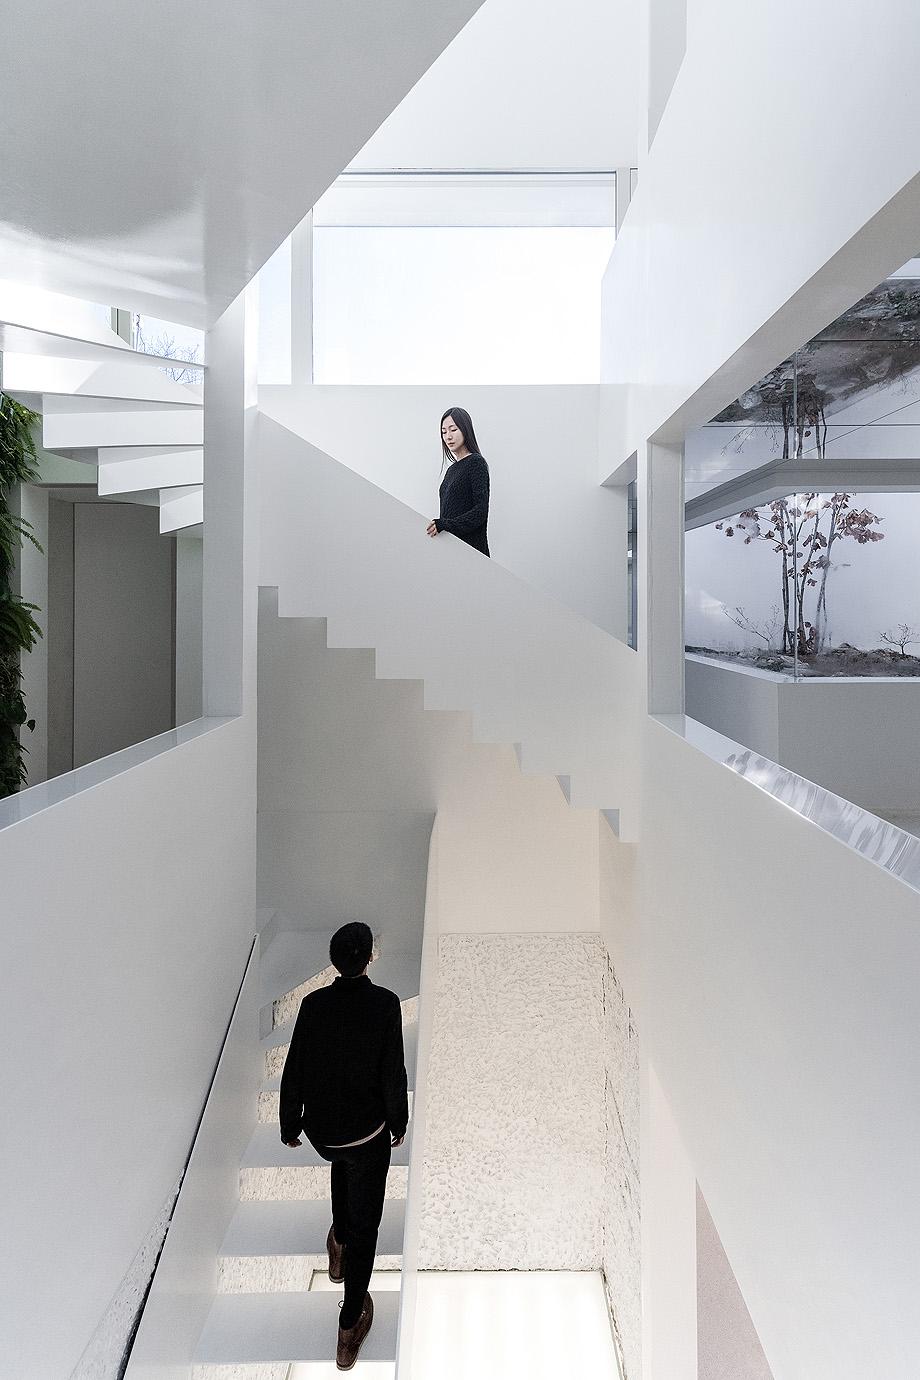 10 mirror garden de archstudio - foto © Wang Ning